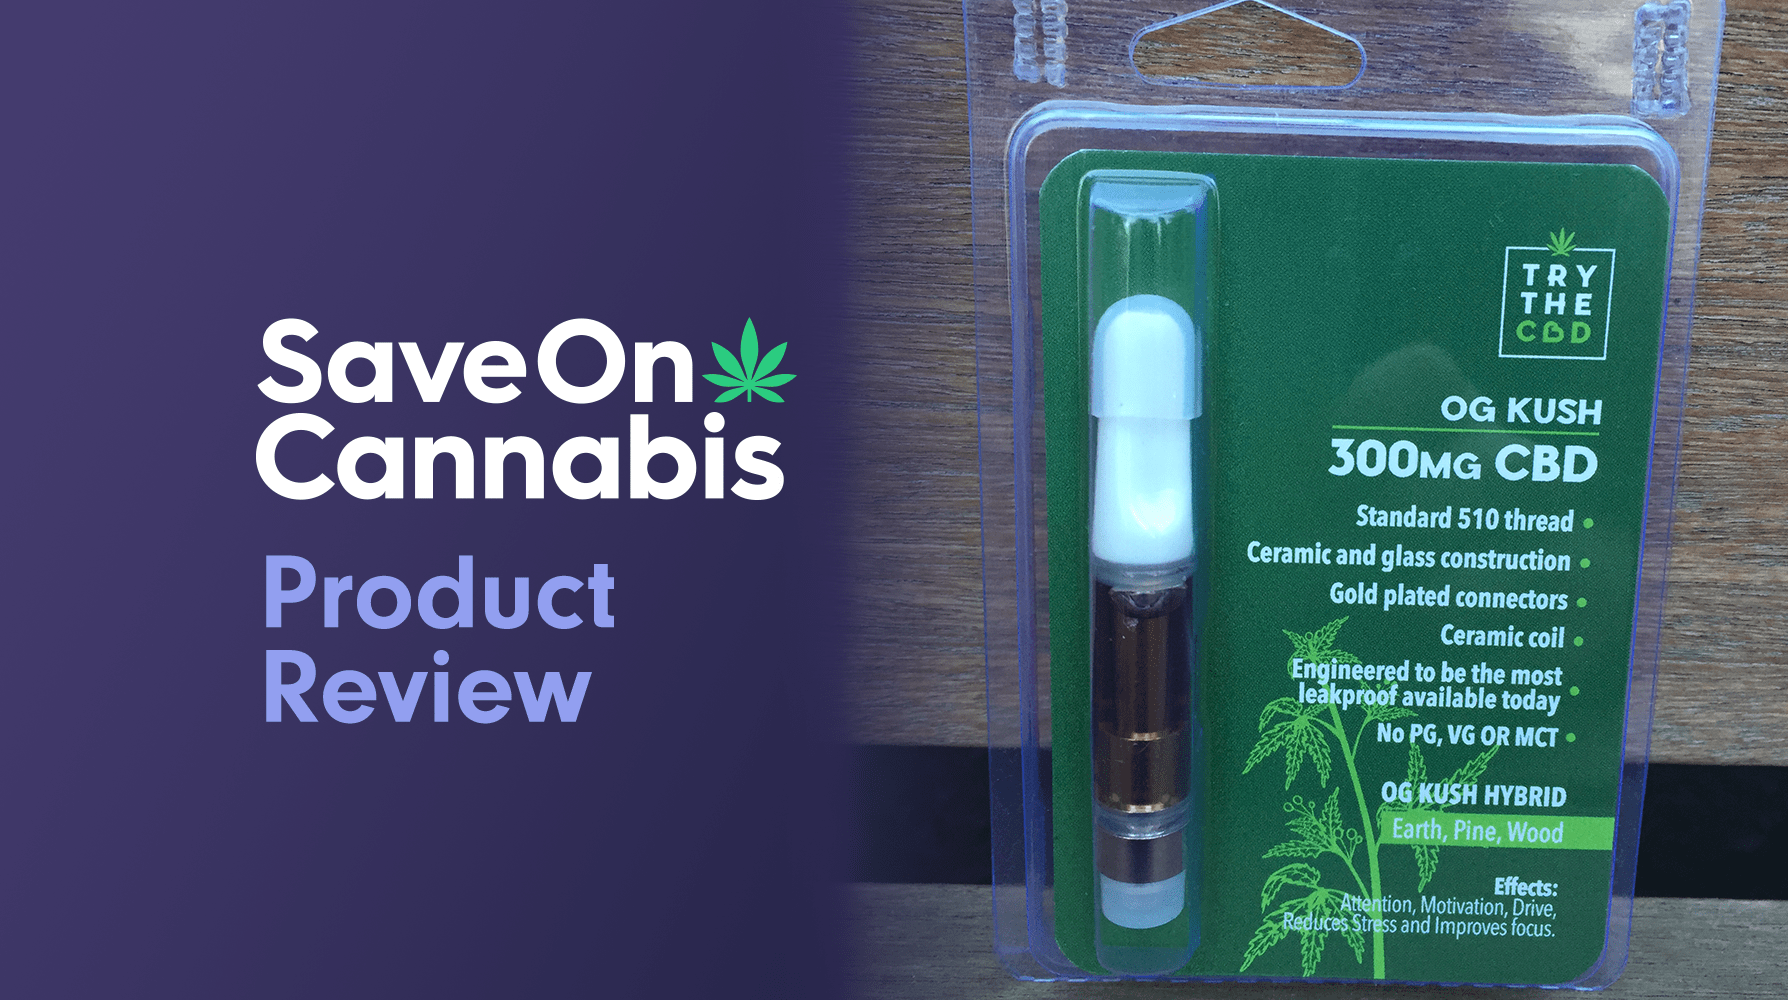 trythecbd og kush cbd vaporizer pen cartridge 300 mg review save on cannabis website